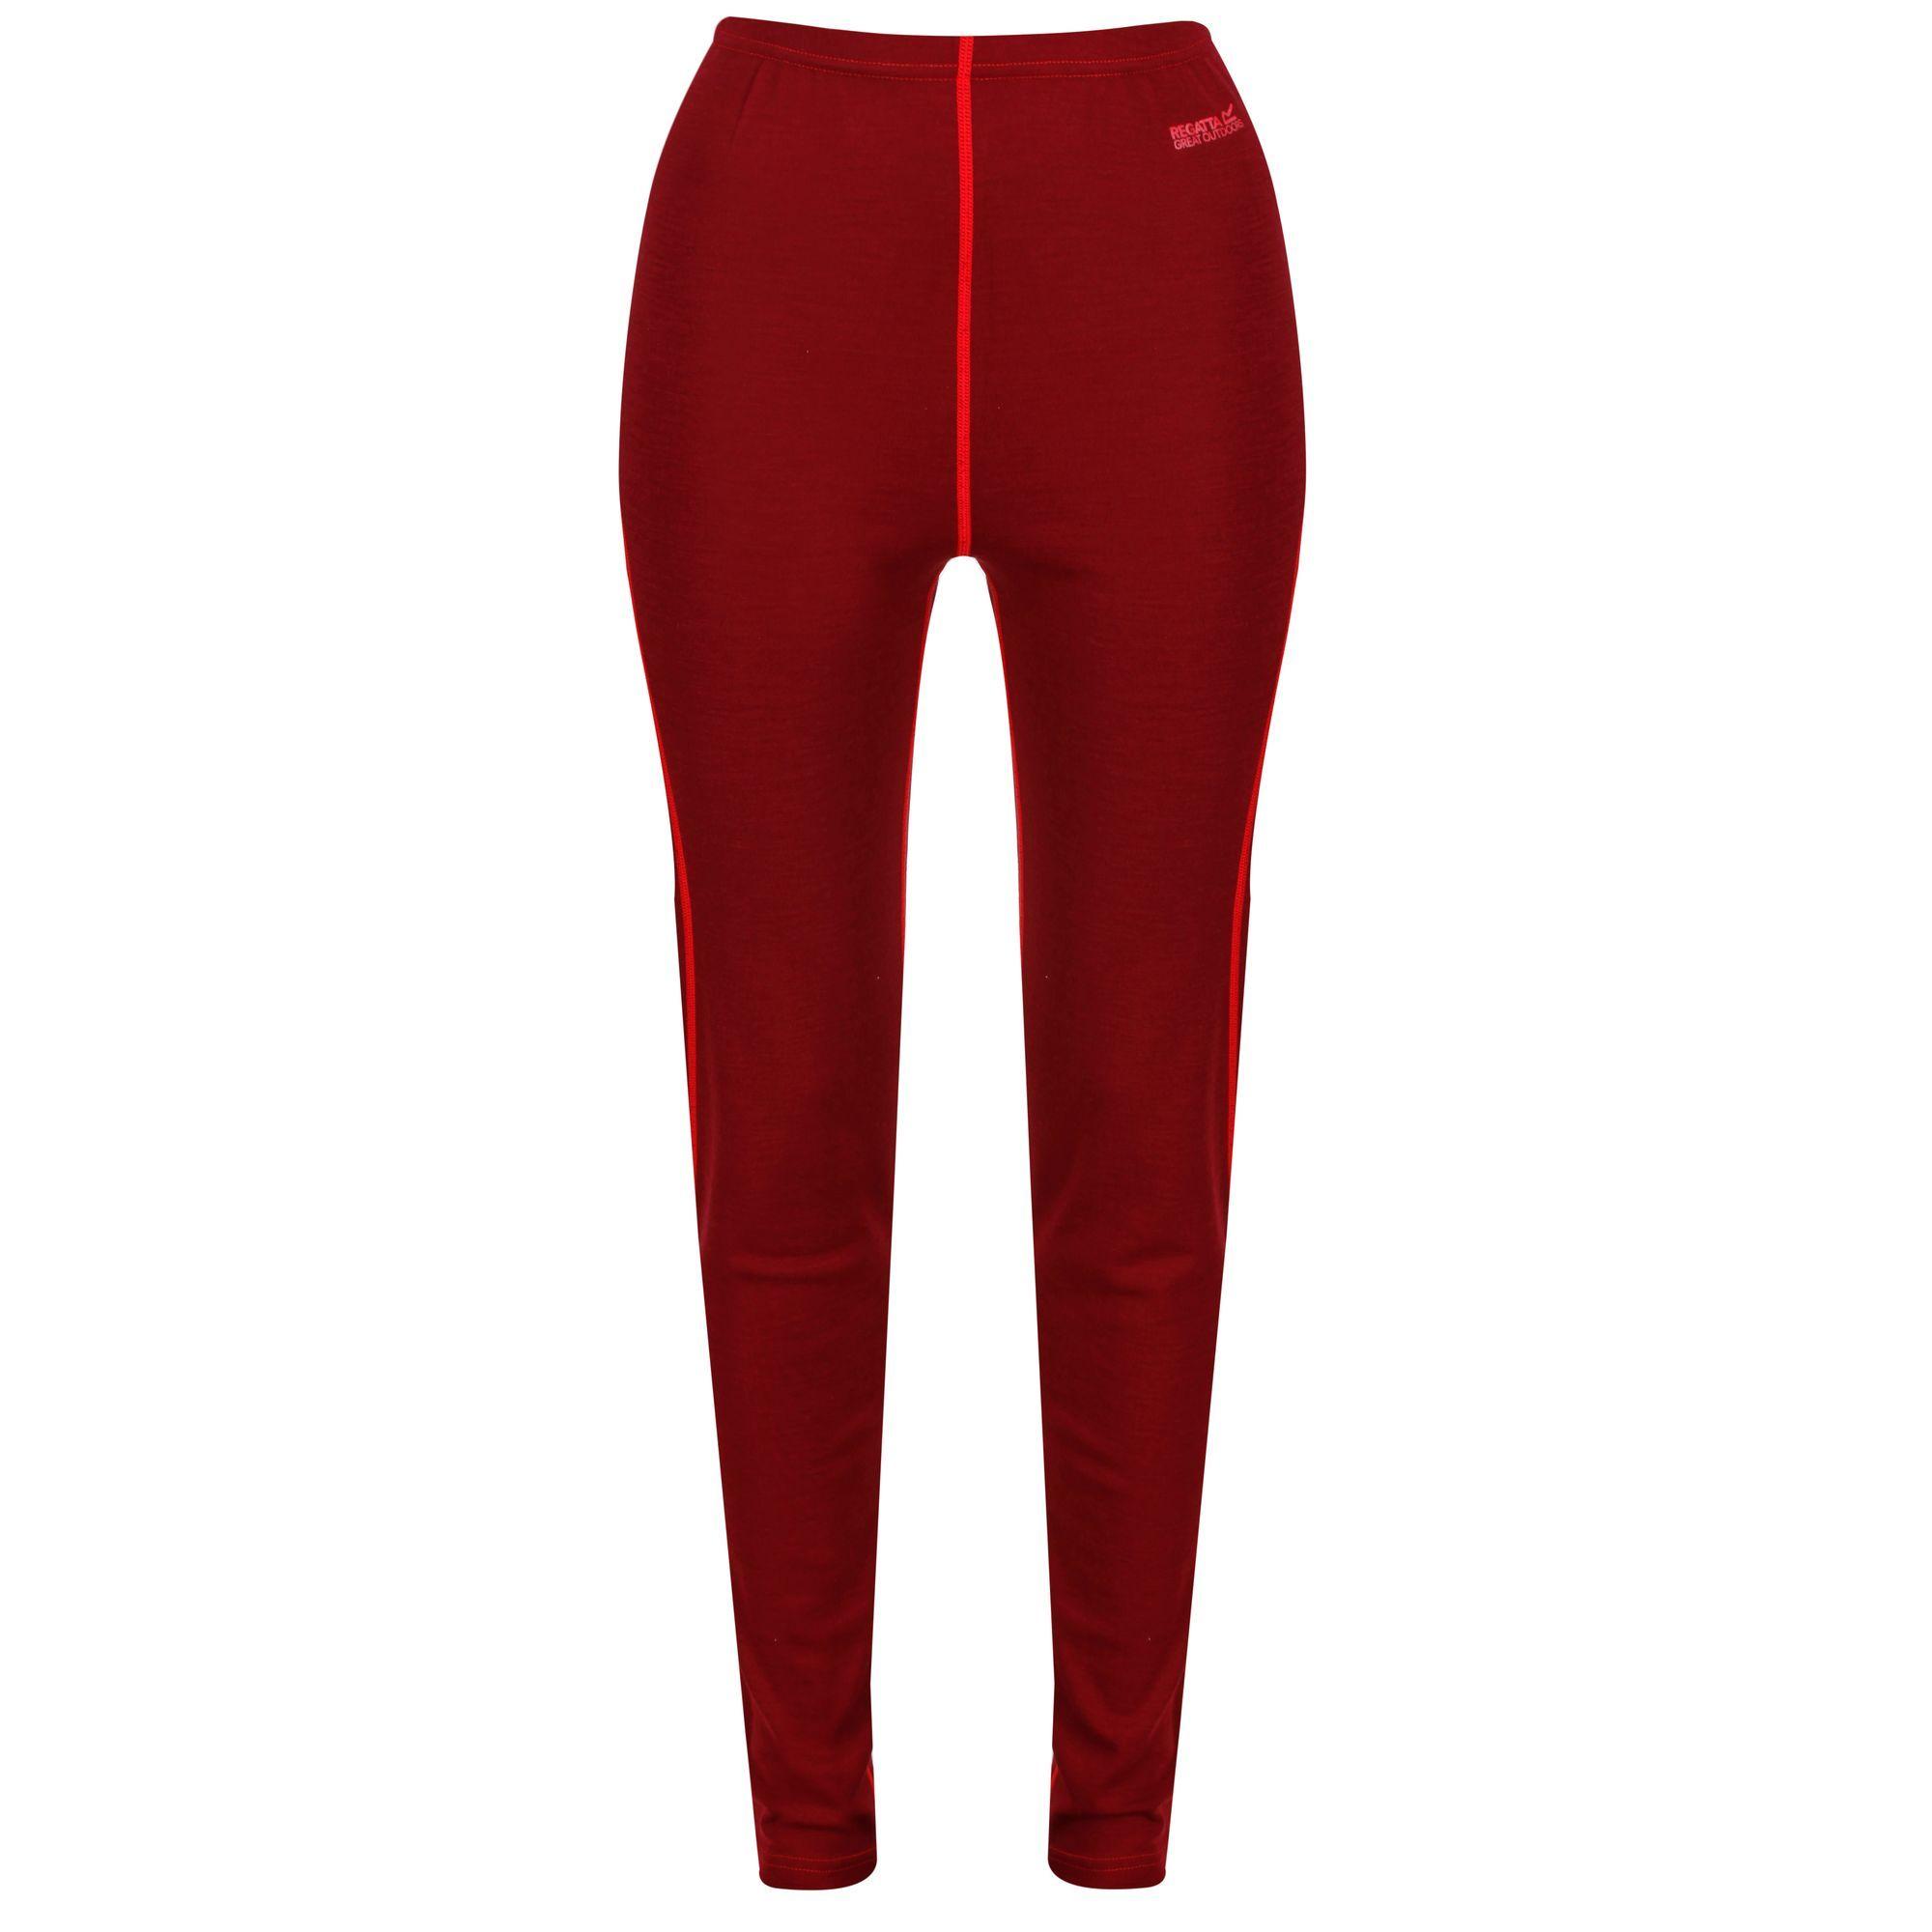 Regatta Womens/Ladies Zimba Base Layer Leggings (8 UK) (Tibetan Red)